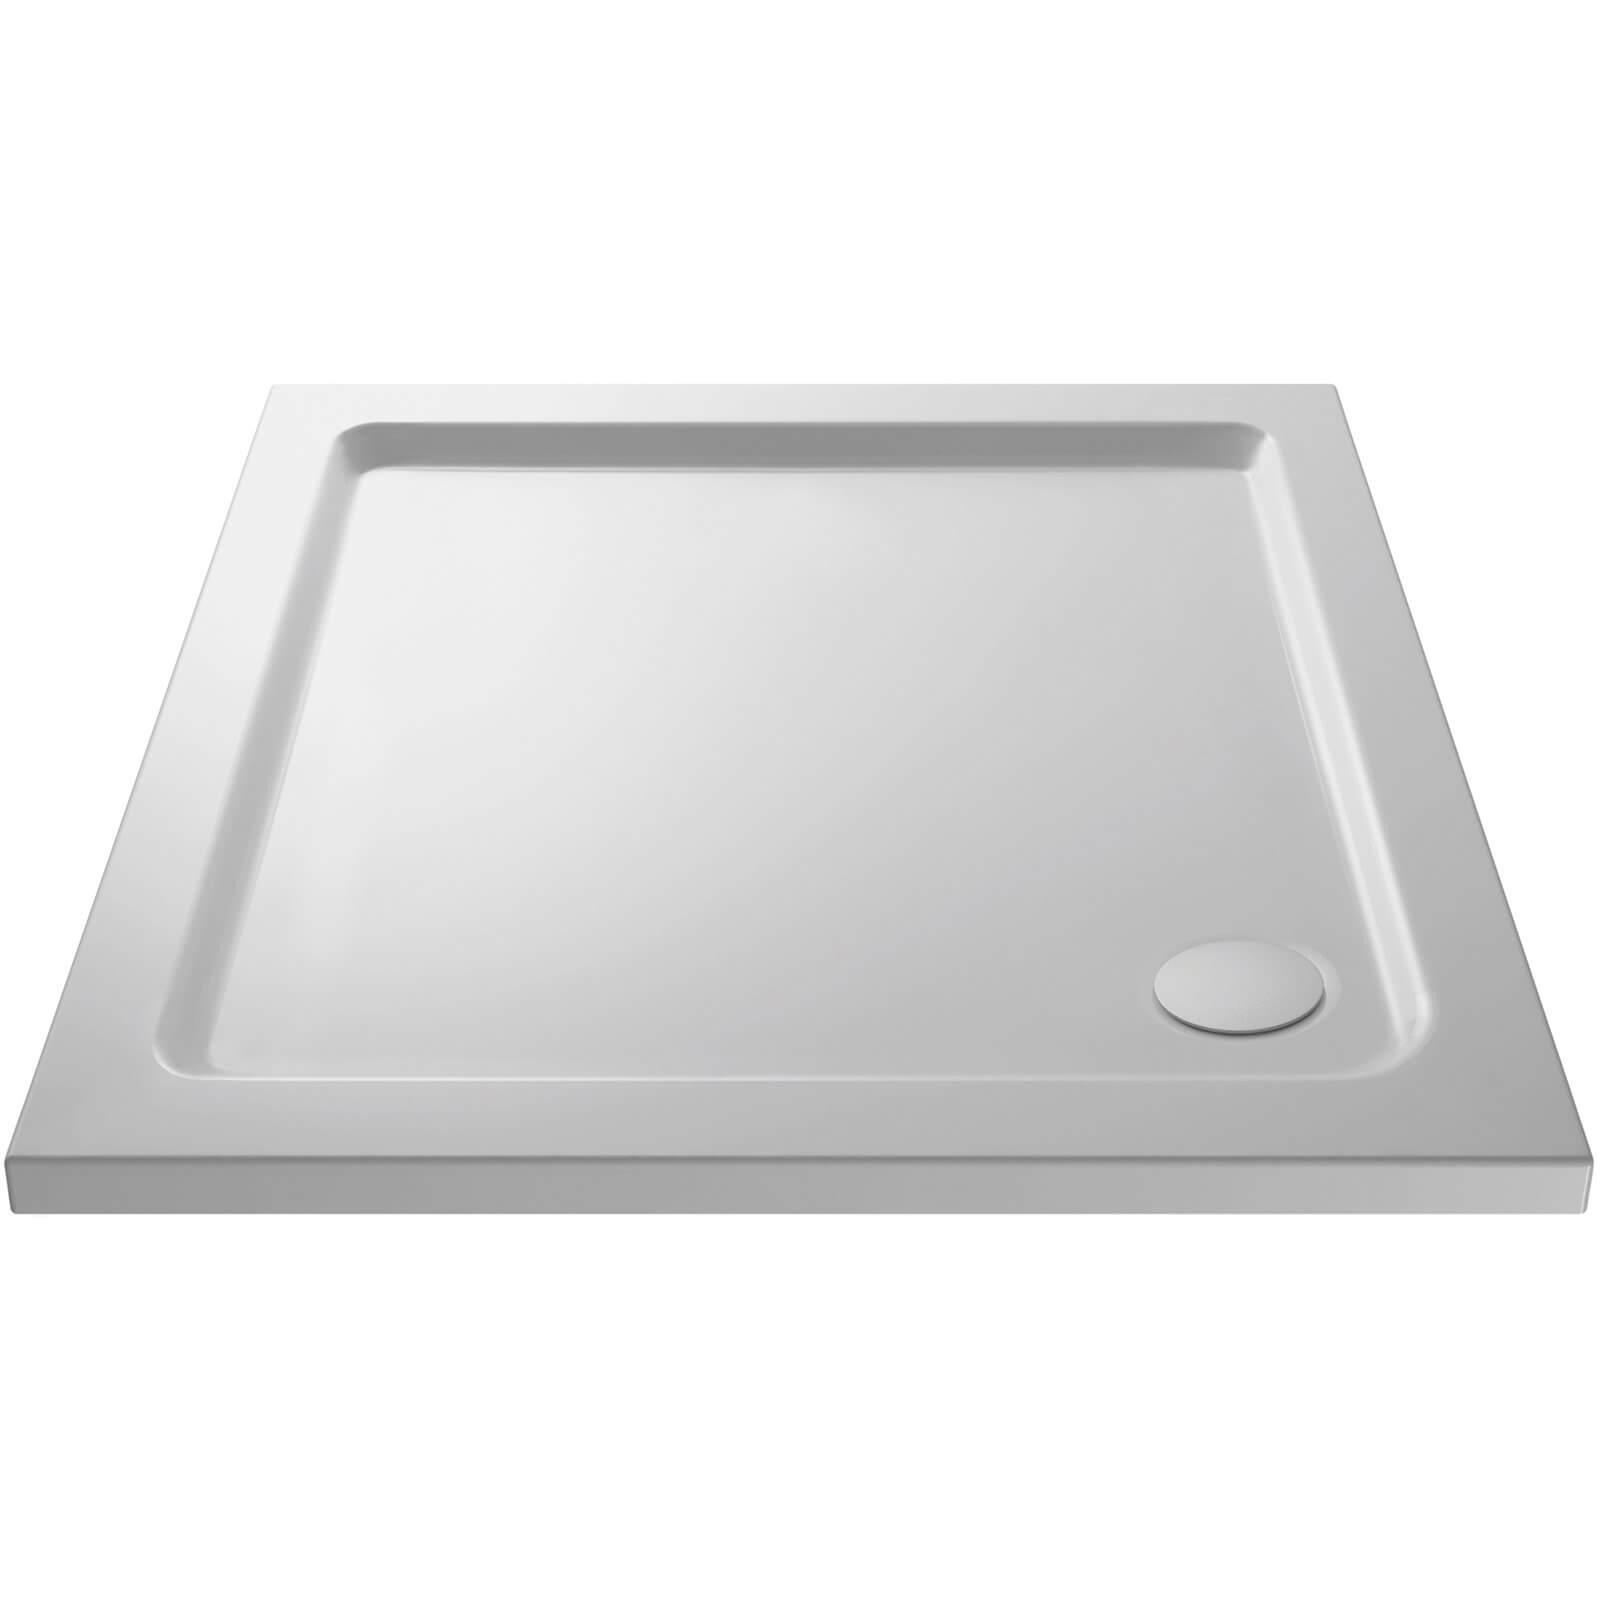 Balterley Square Shower Tray - 900 x 900mm